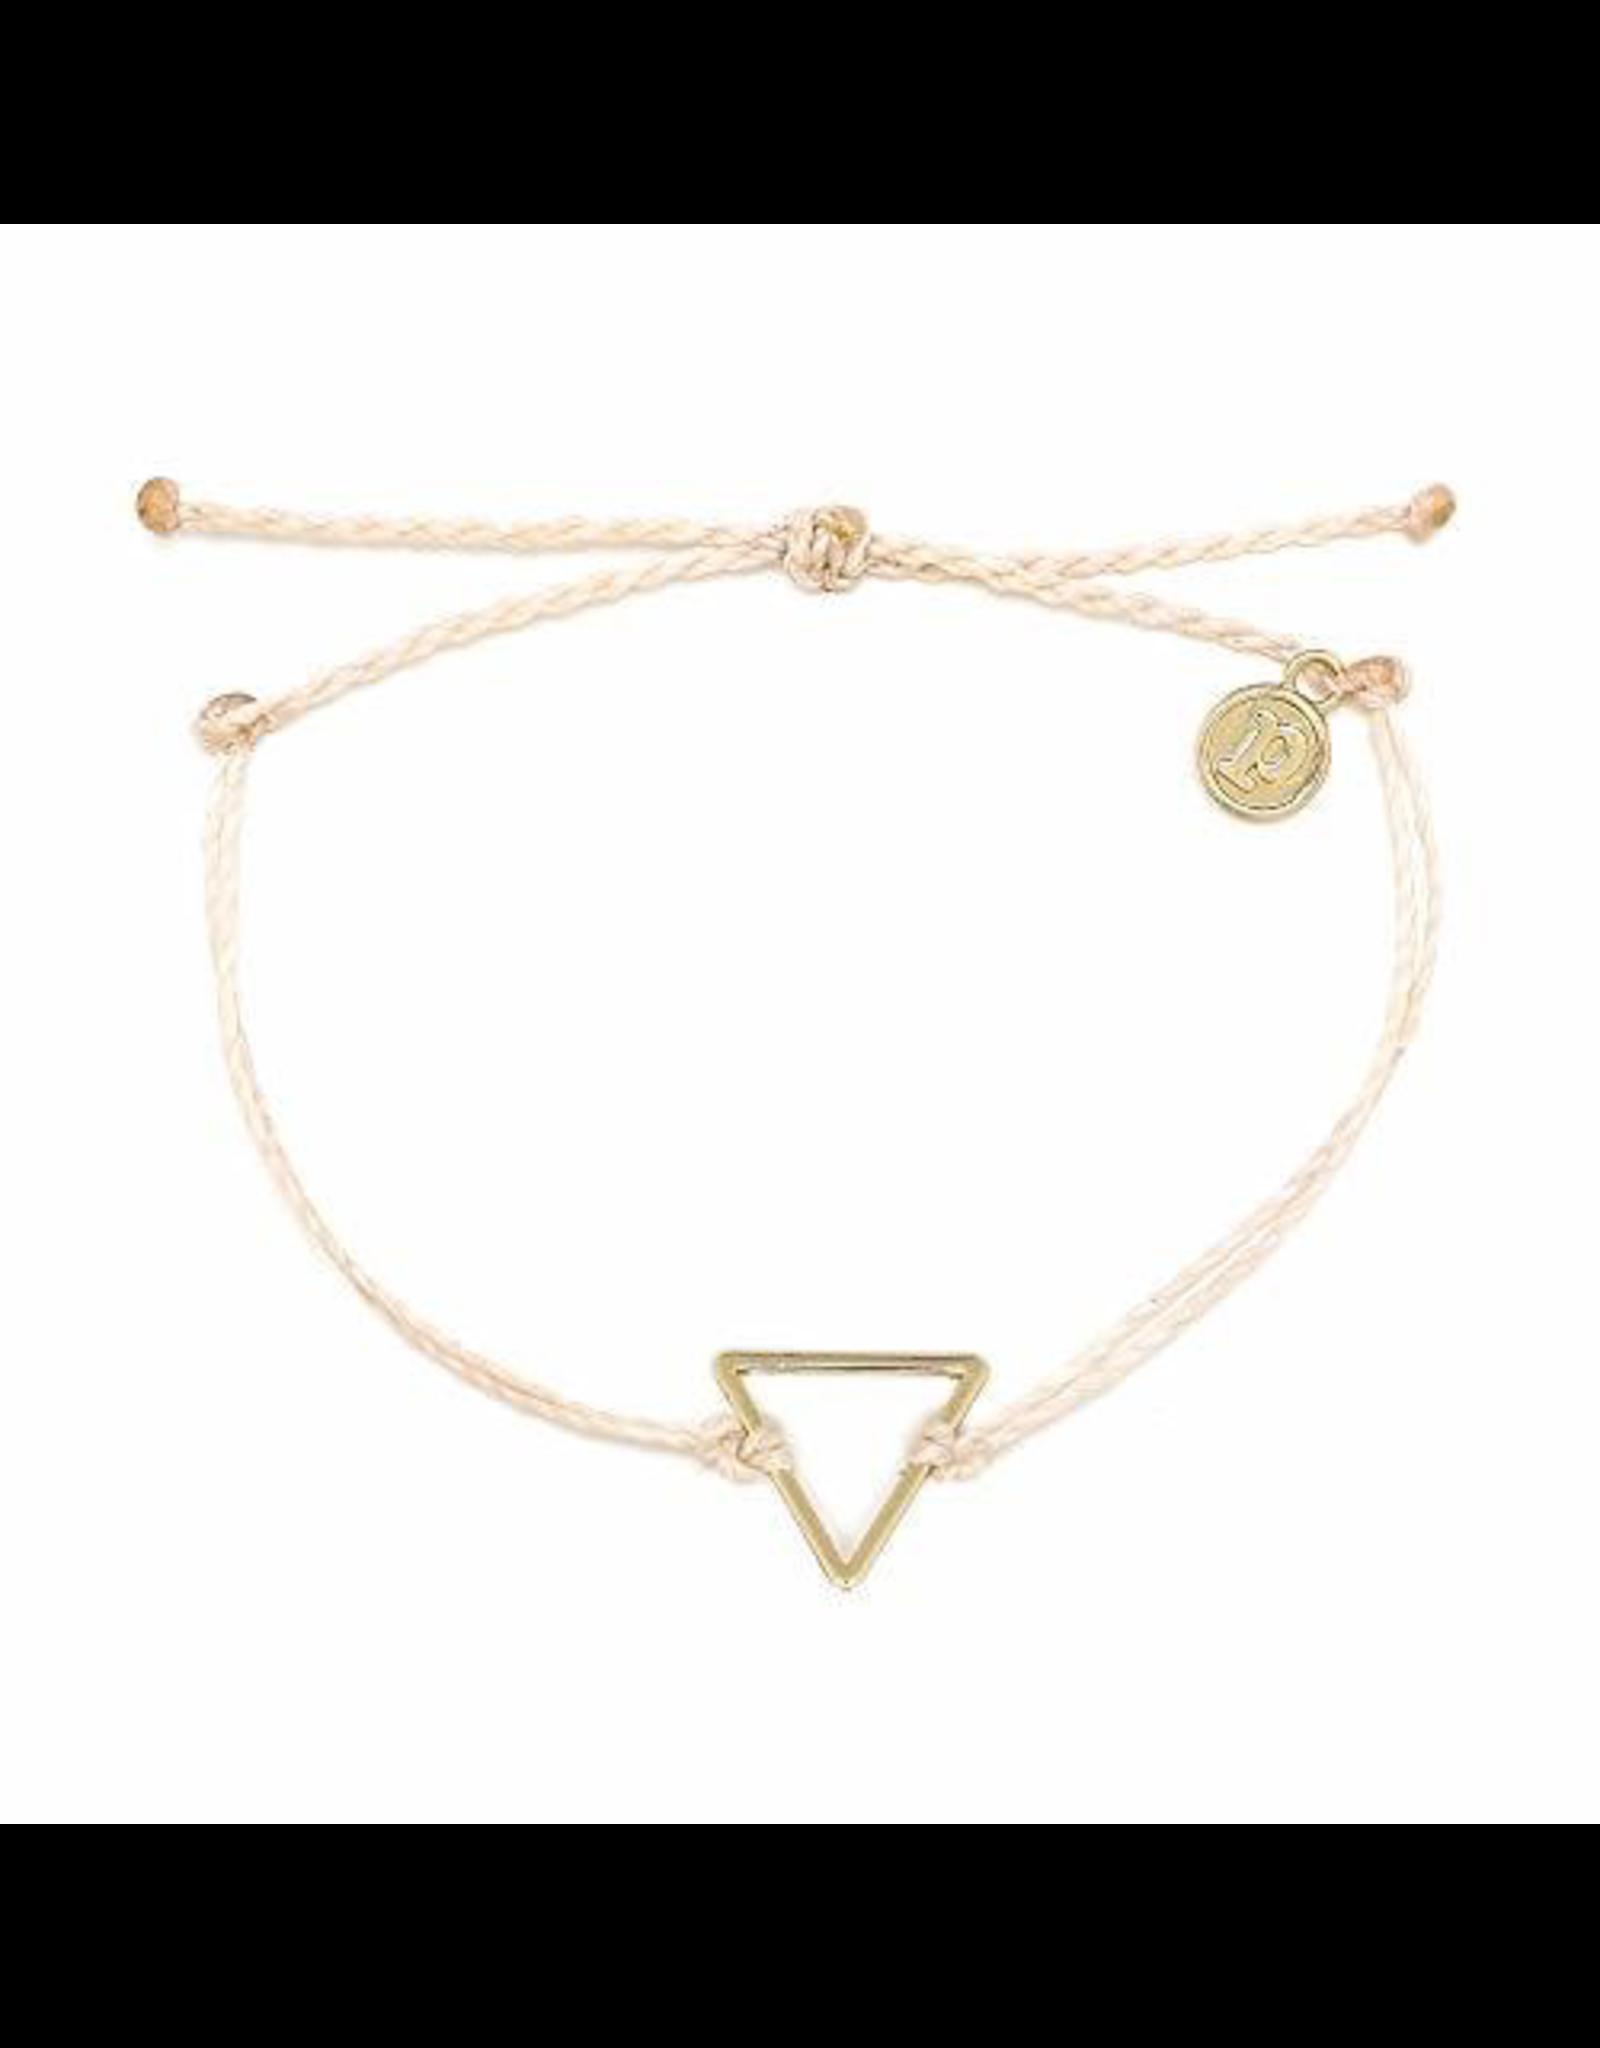 PURA VIDA Triangle Charm Braided Bracelet